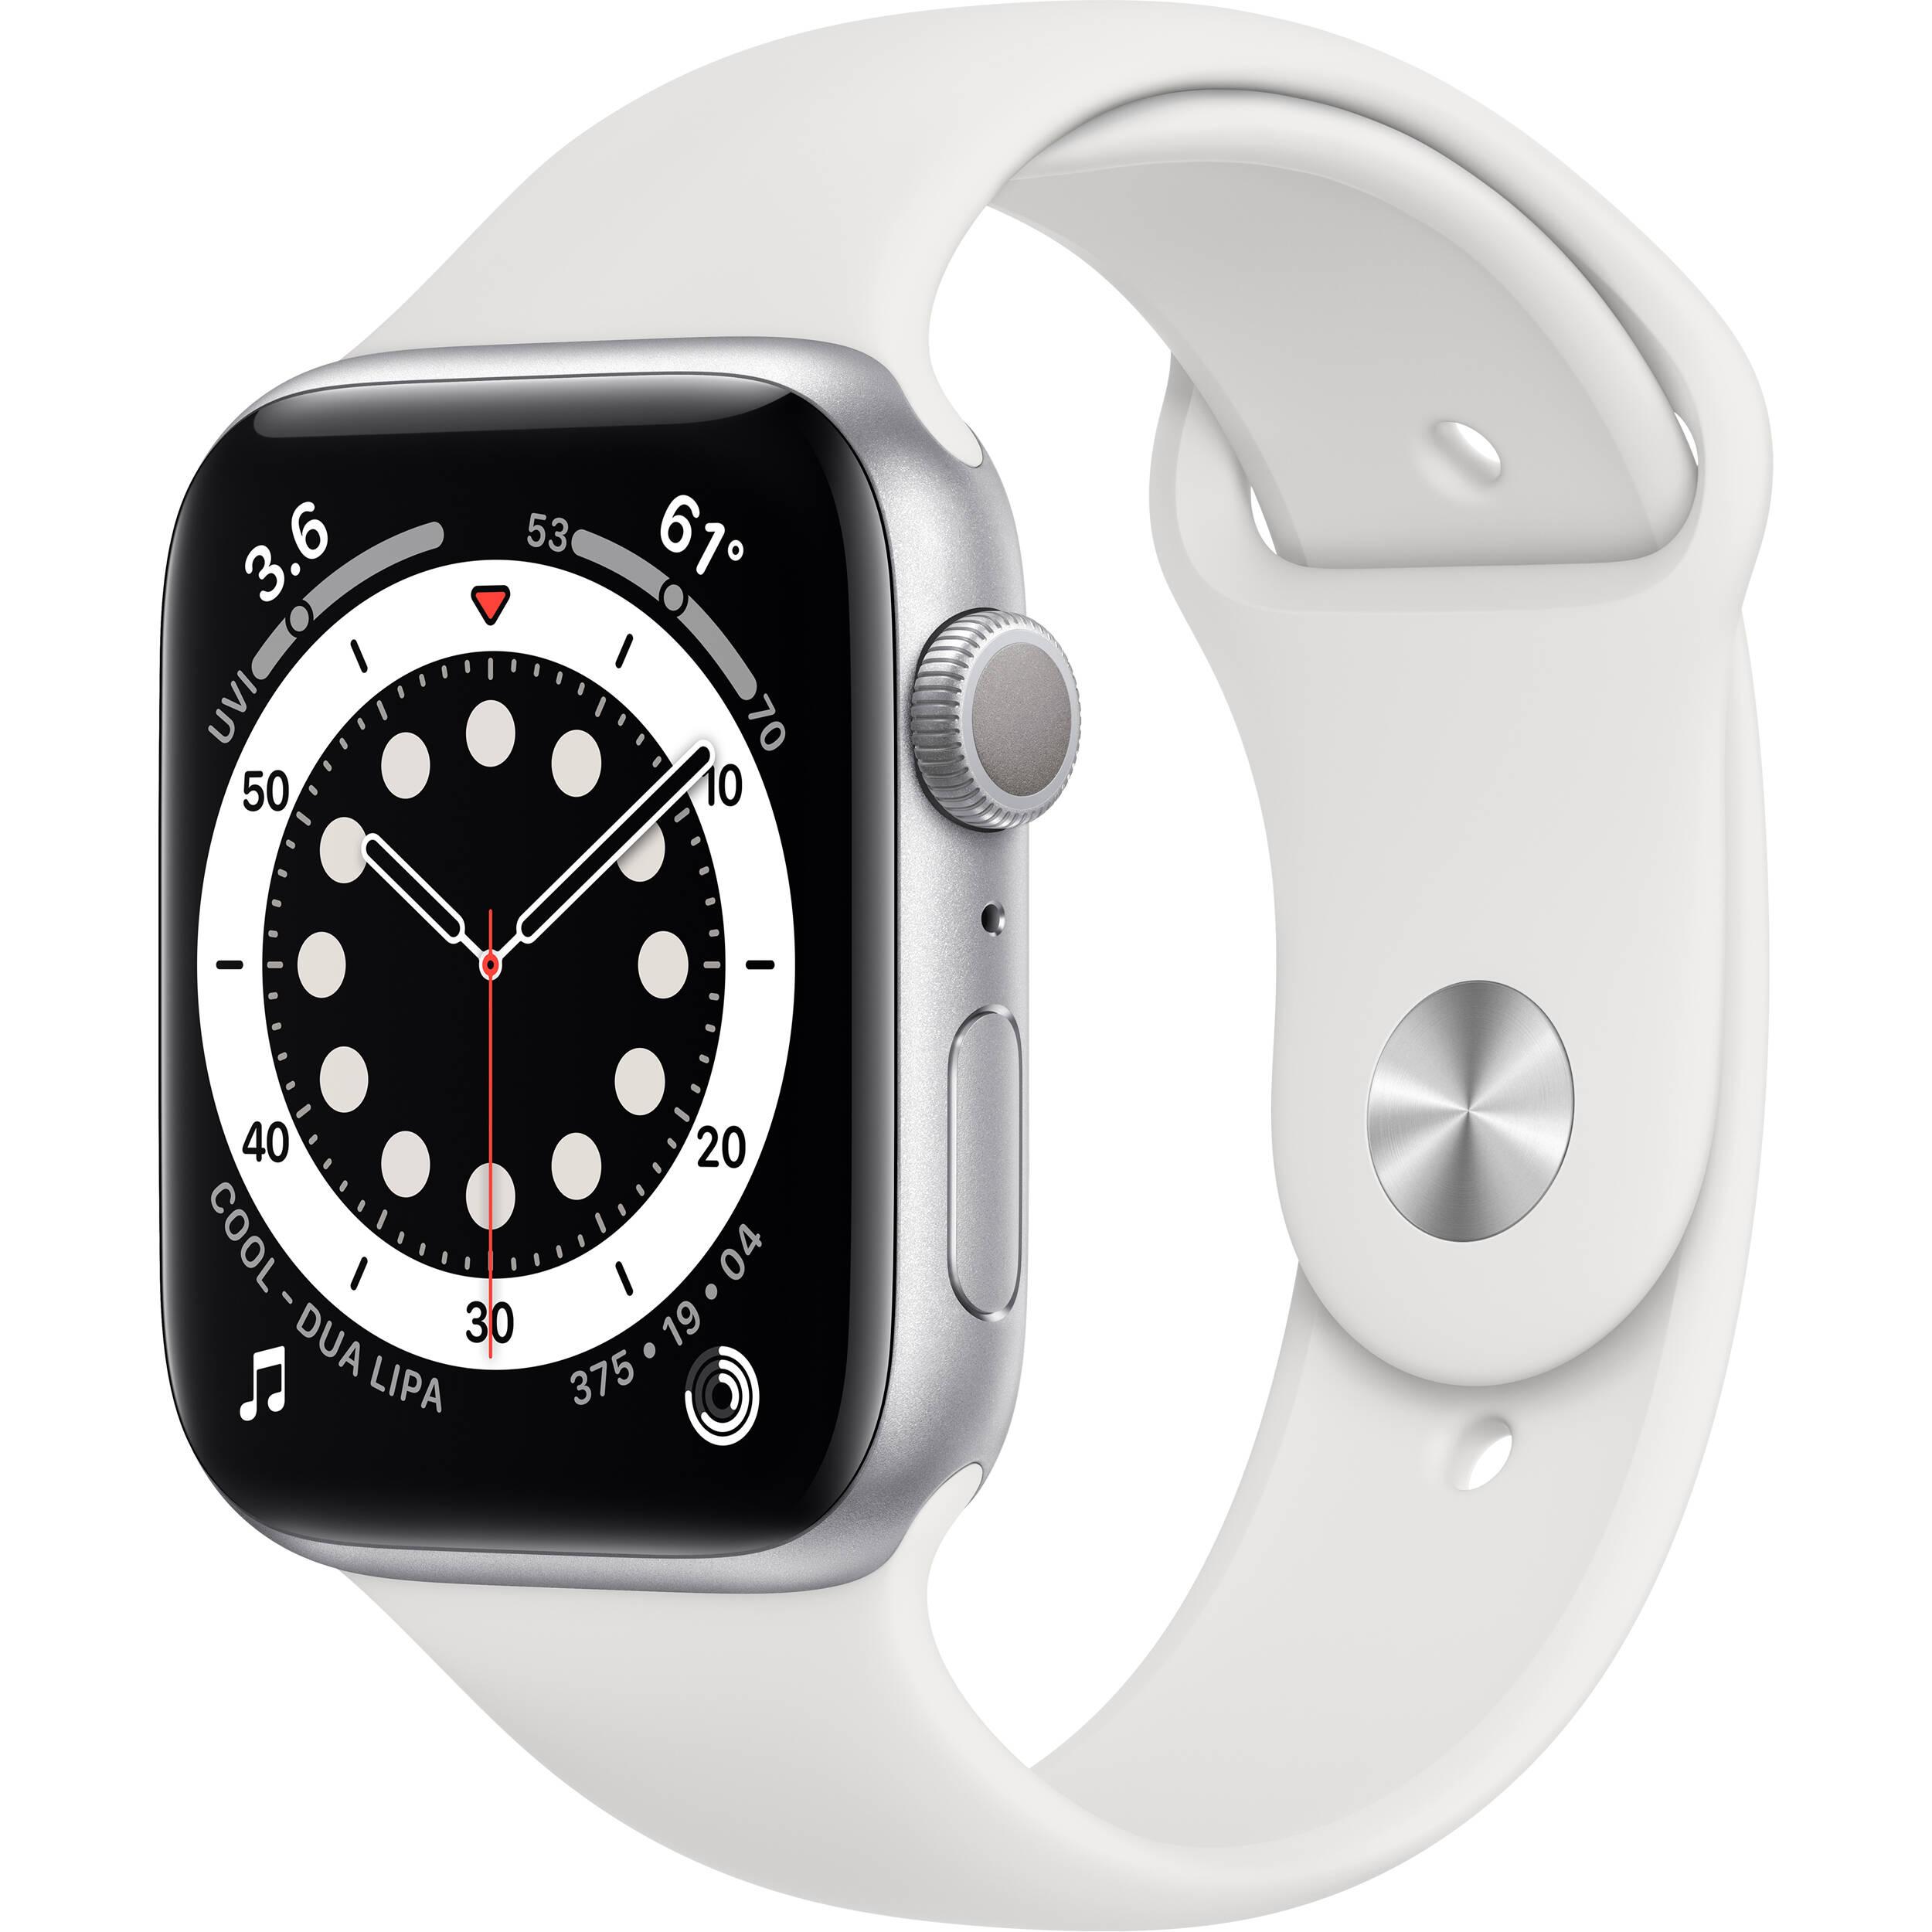 Apple Watch Series 6 M00D3LL/A B&H Photo Video